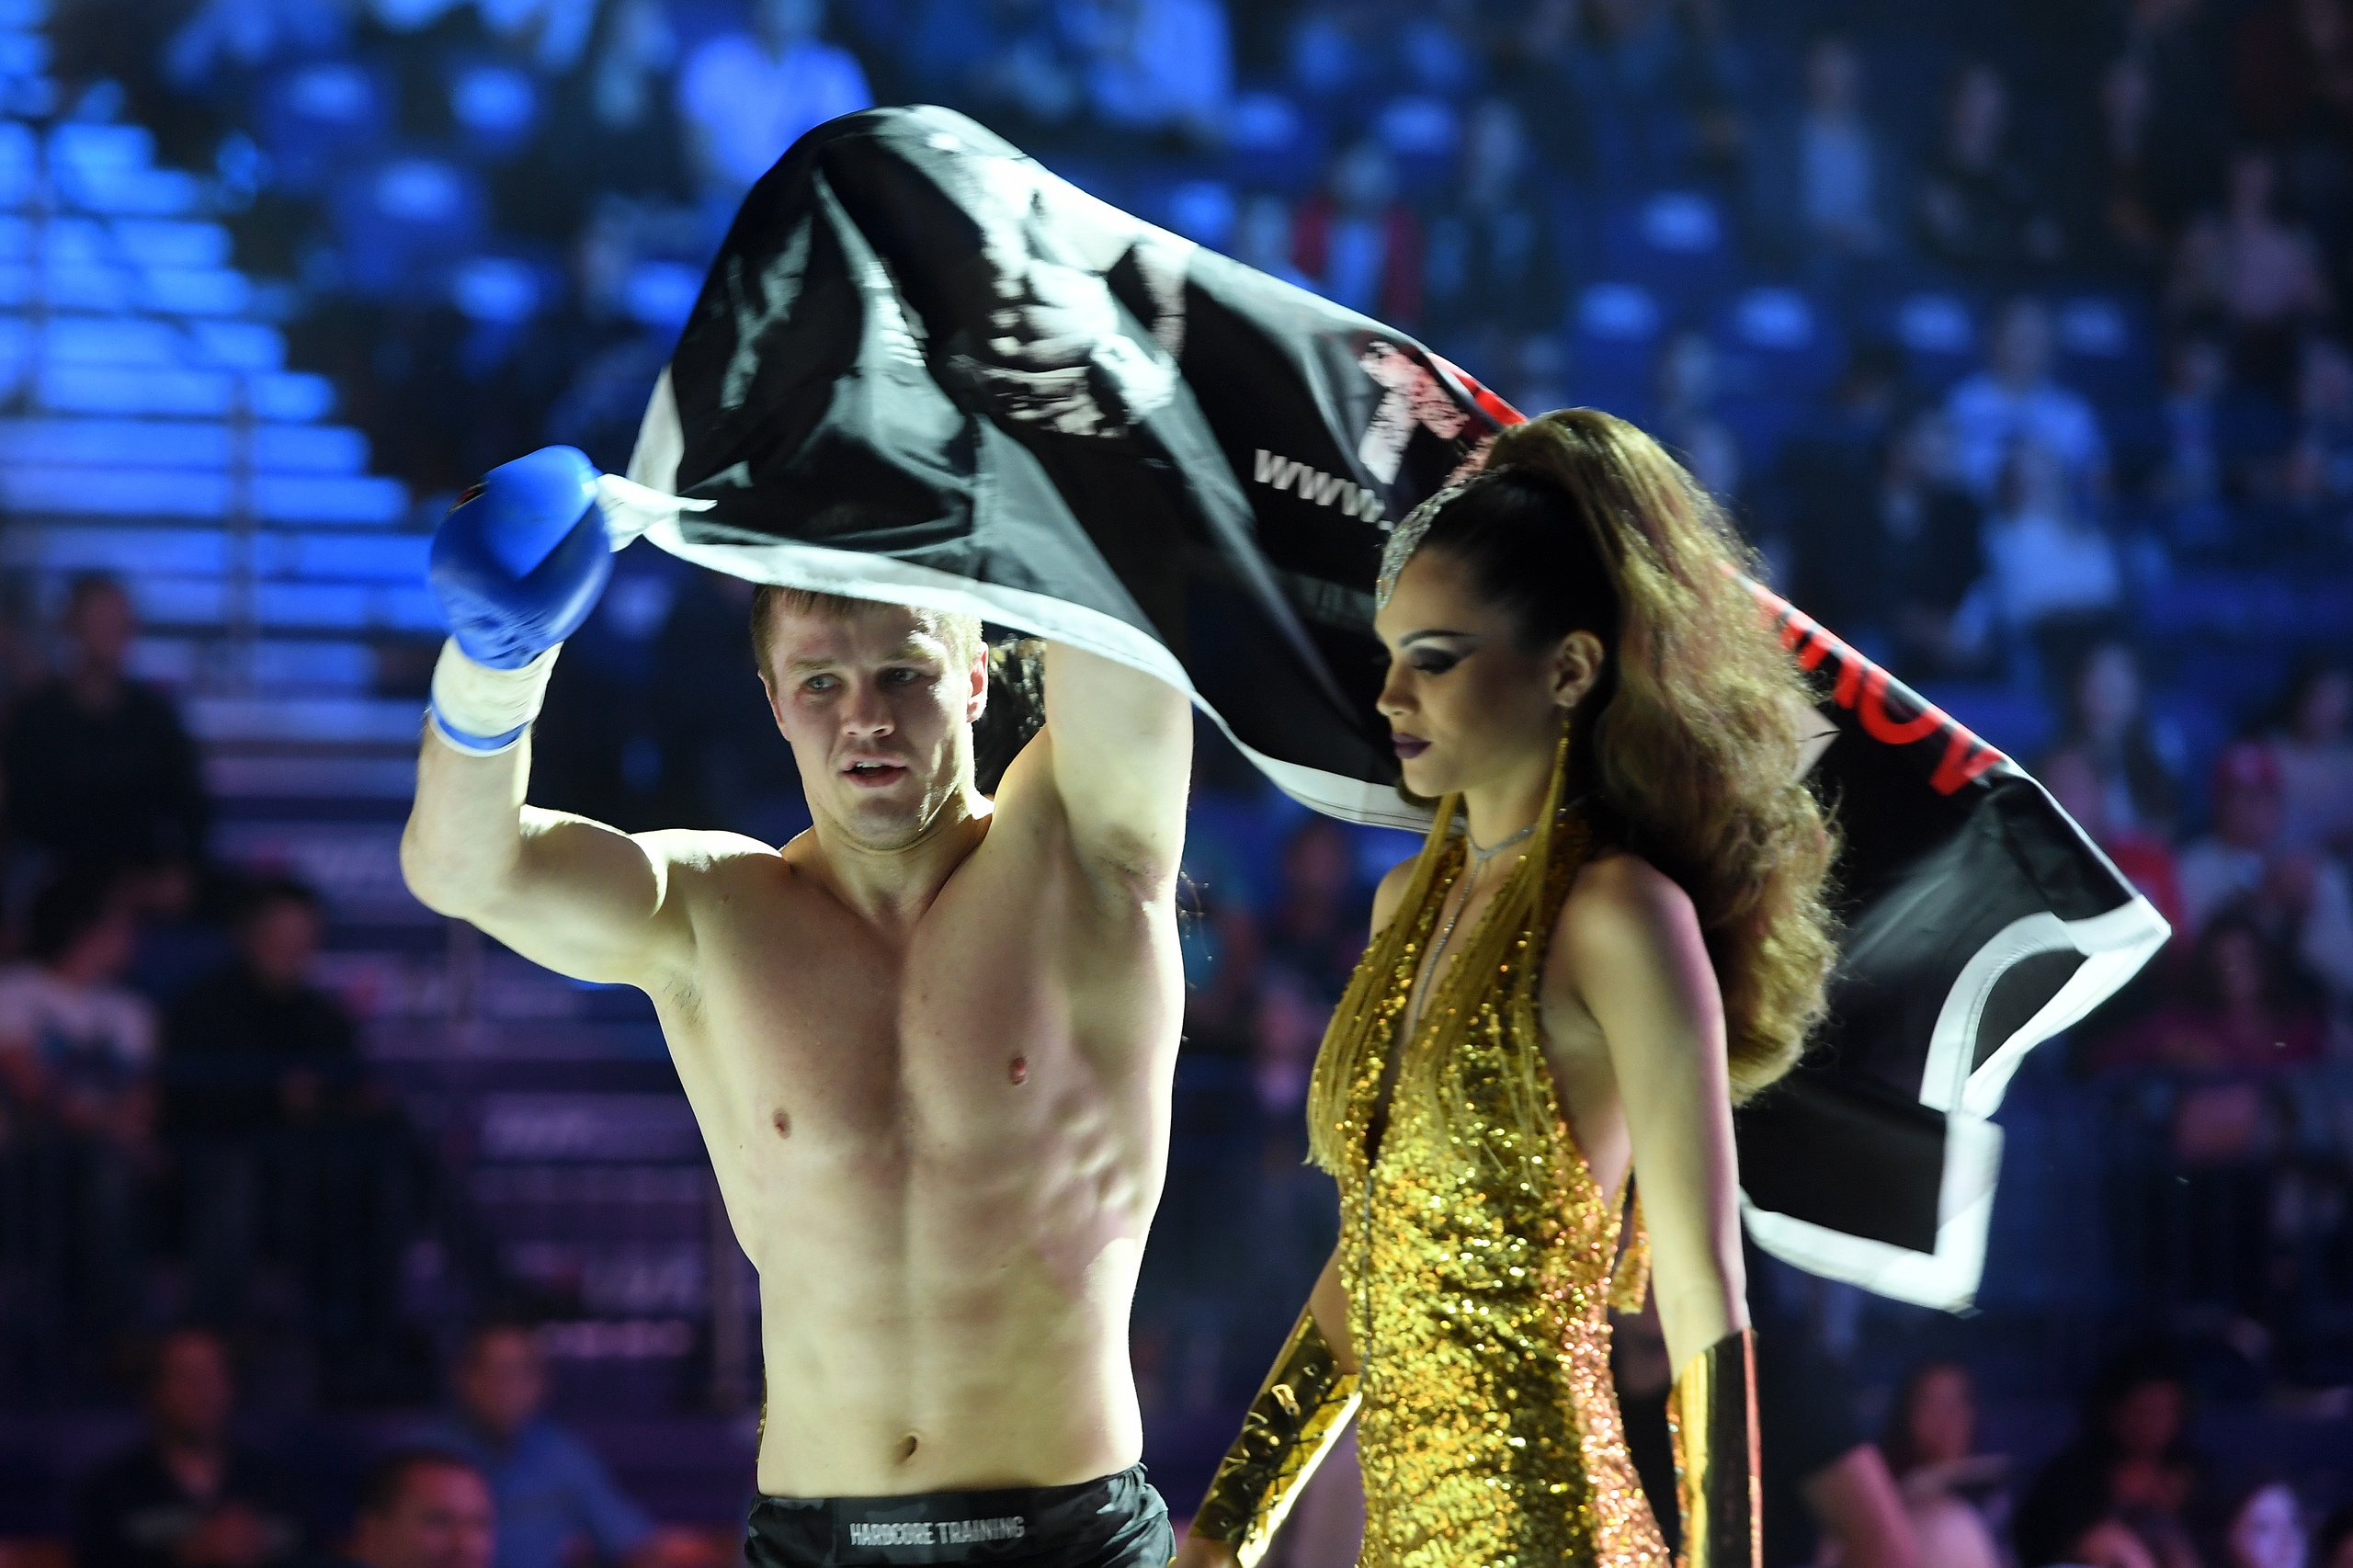 tat neft arena kickboxing ivan kondratiev konstantin serebrennikov